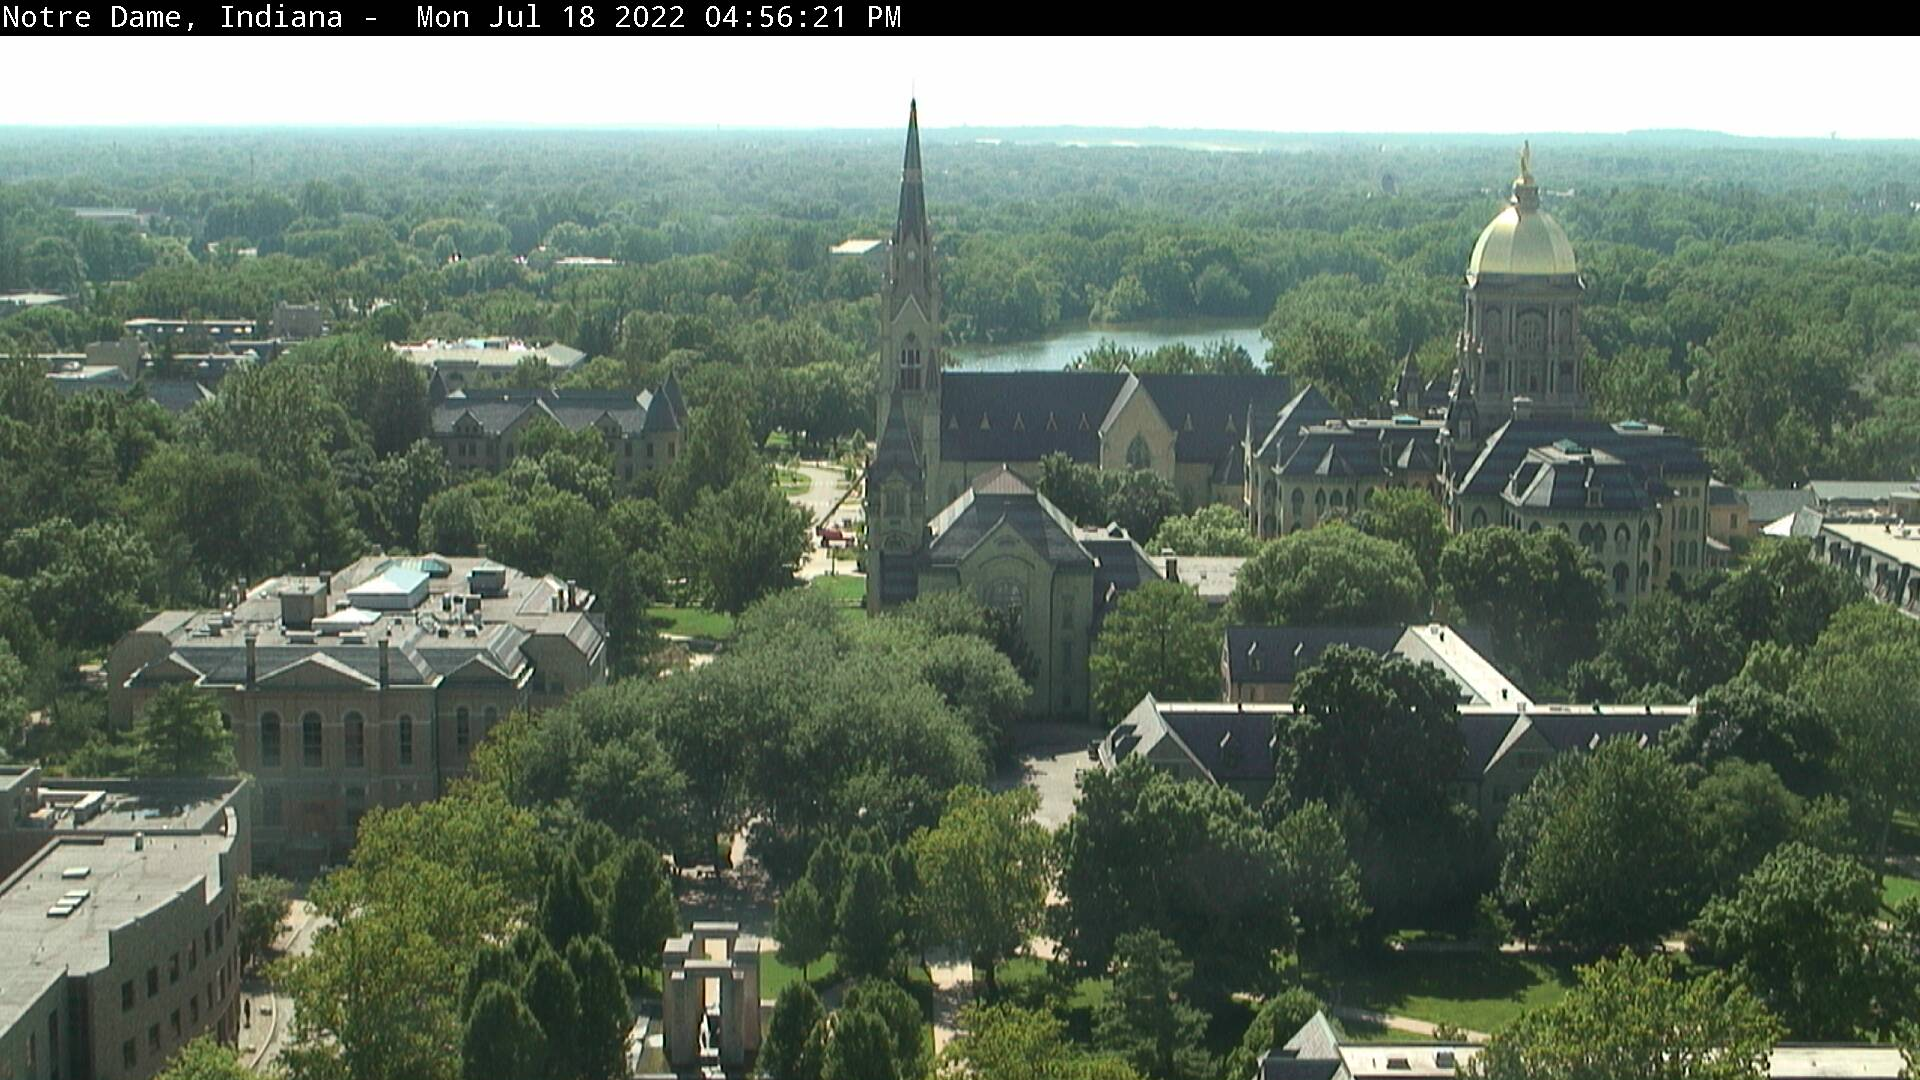 Notre Dame, Indiana Sat. 16:56